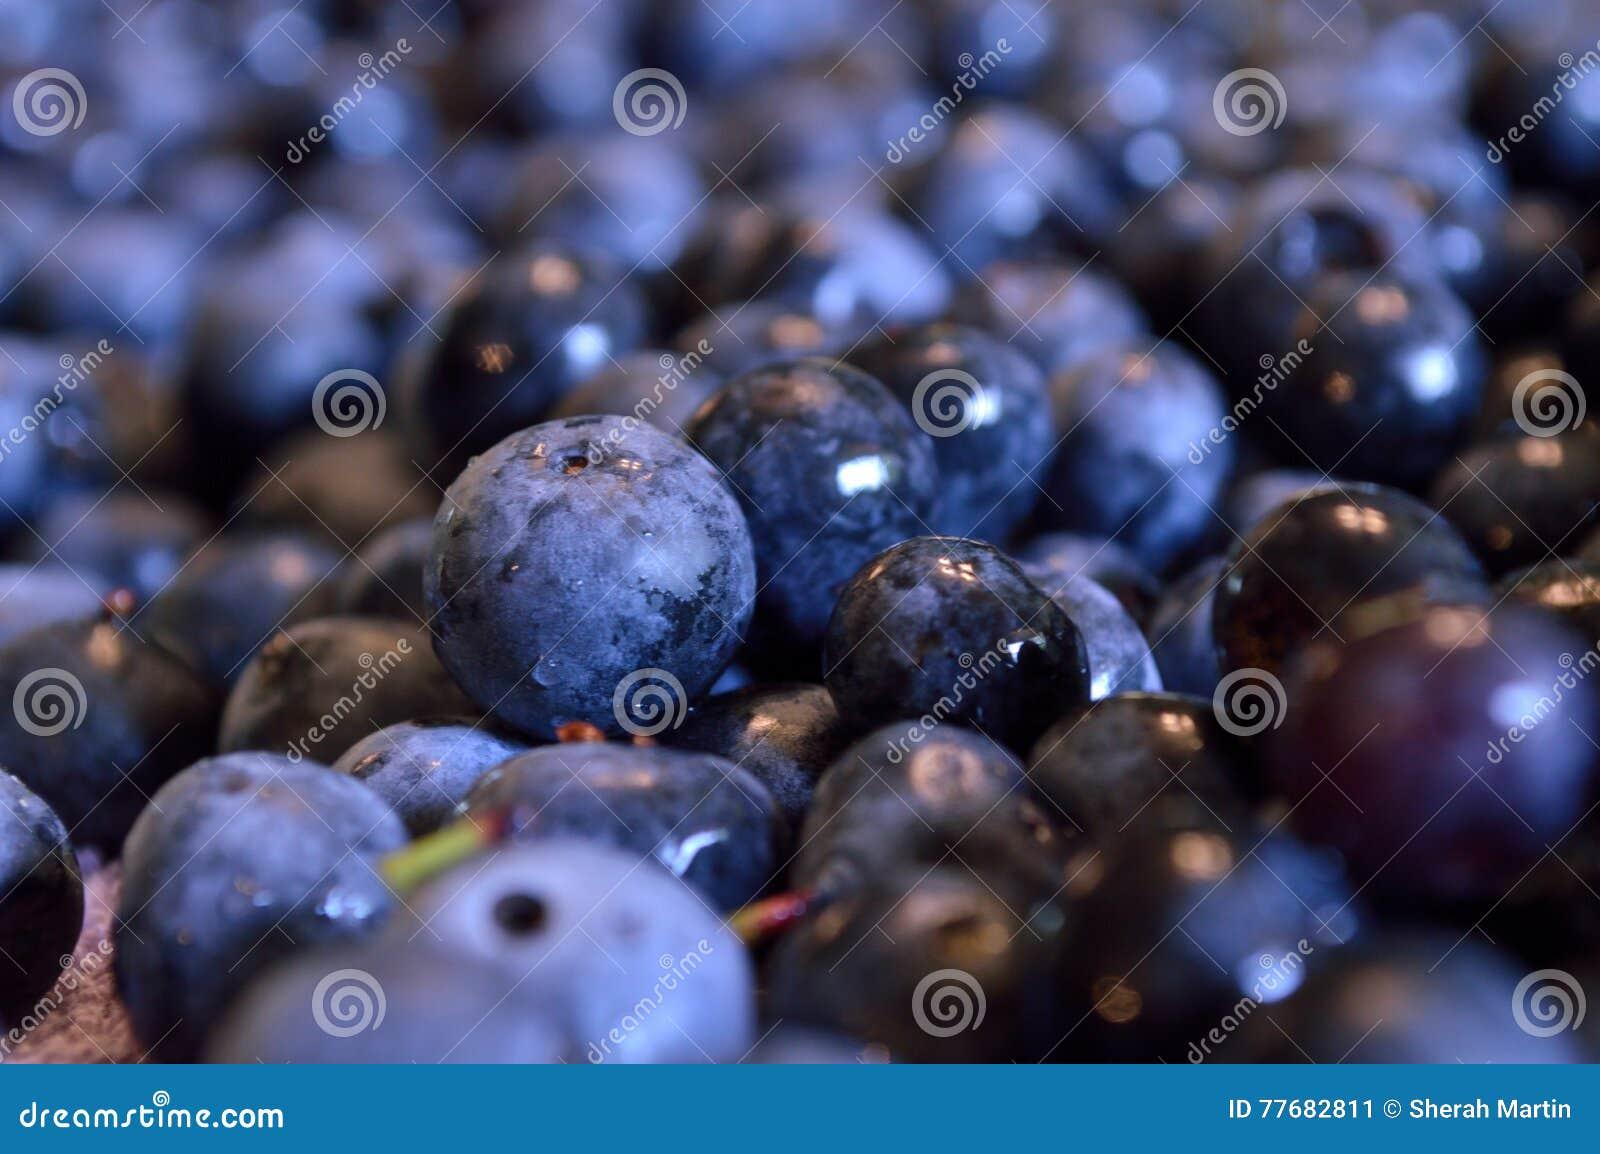 Closeup of wet blueberries